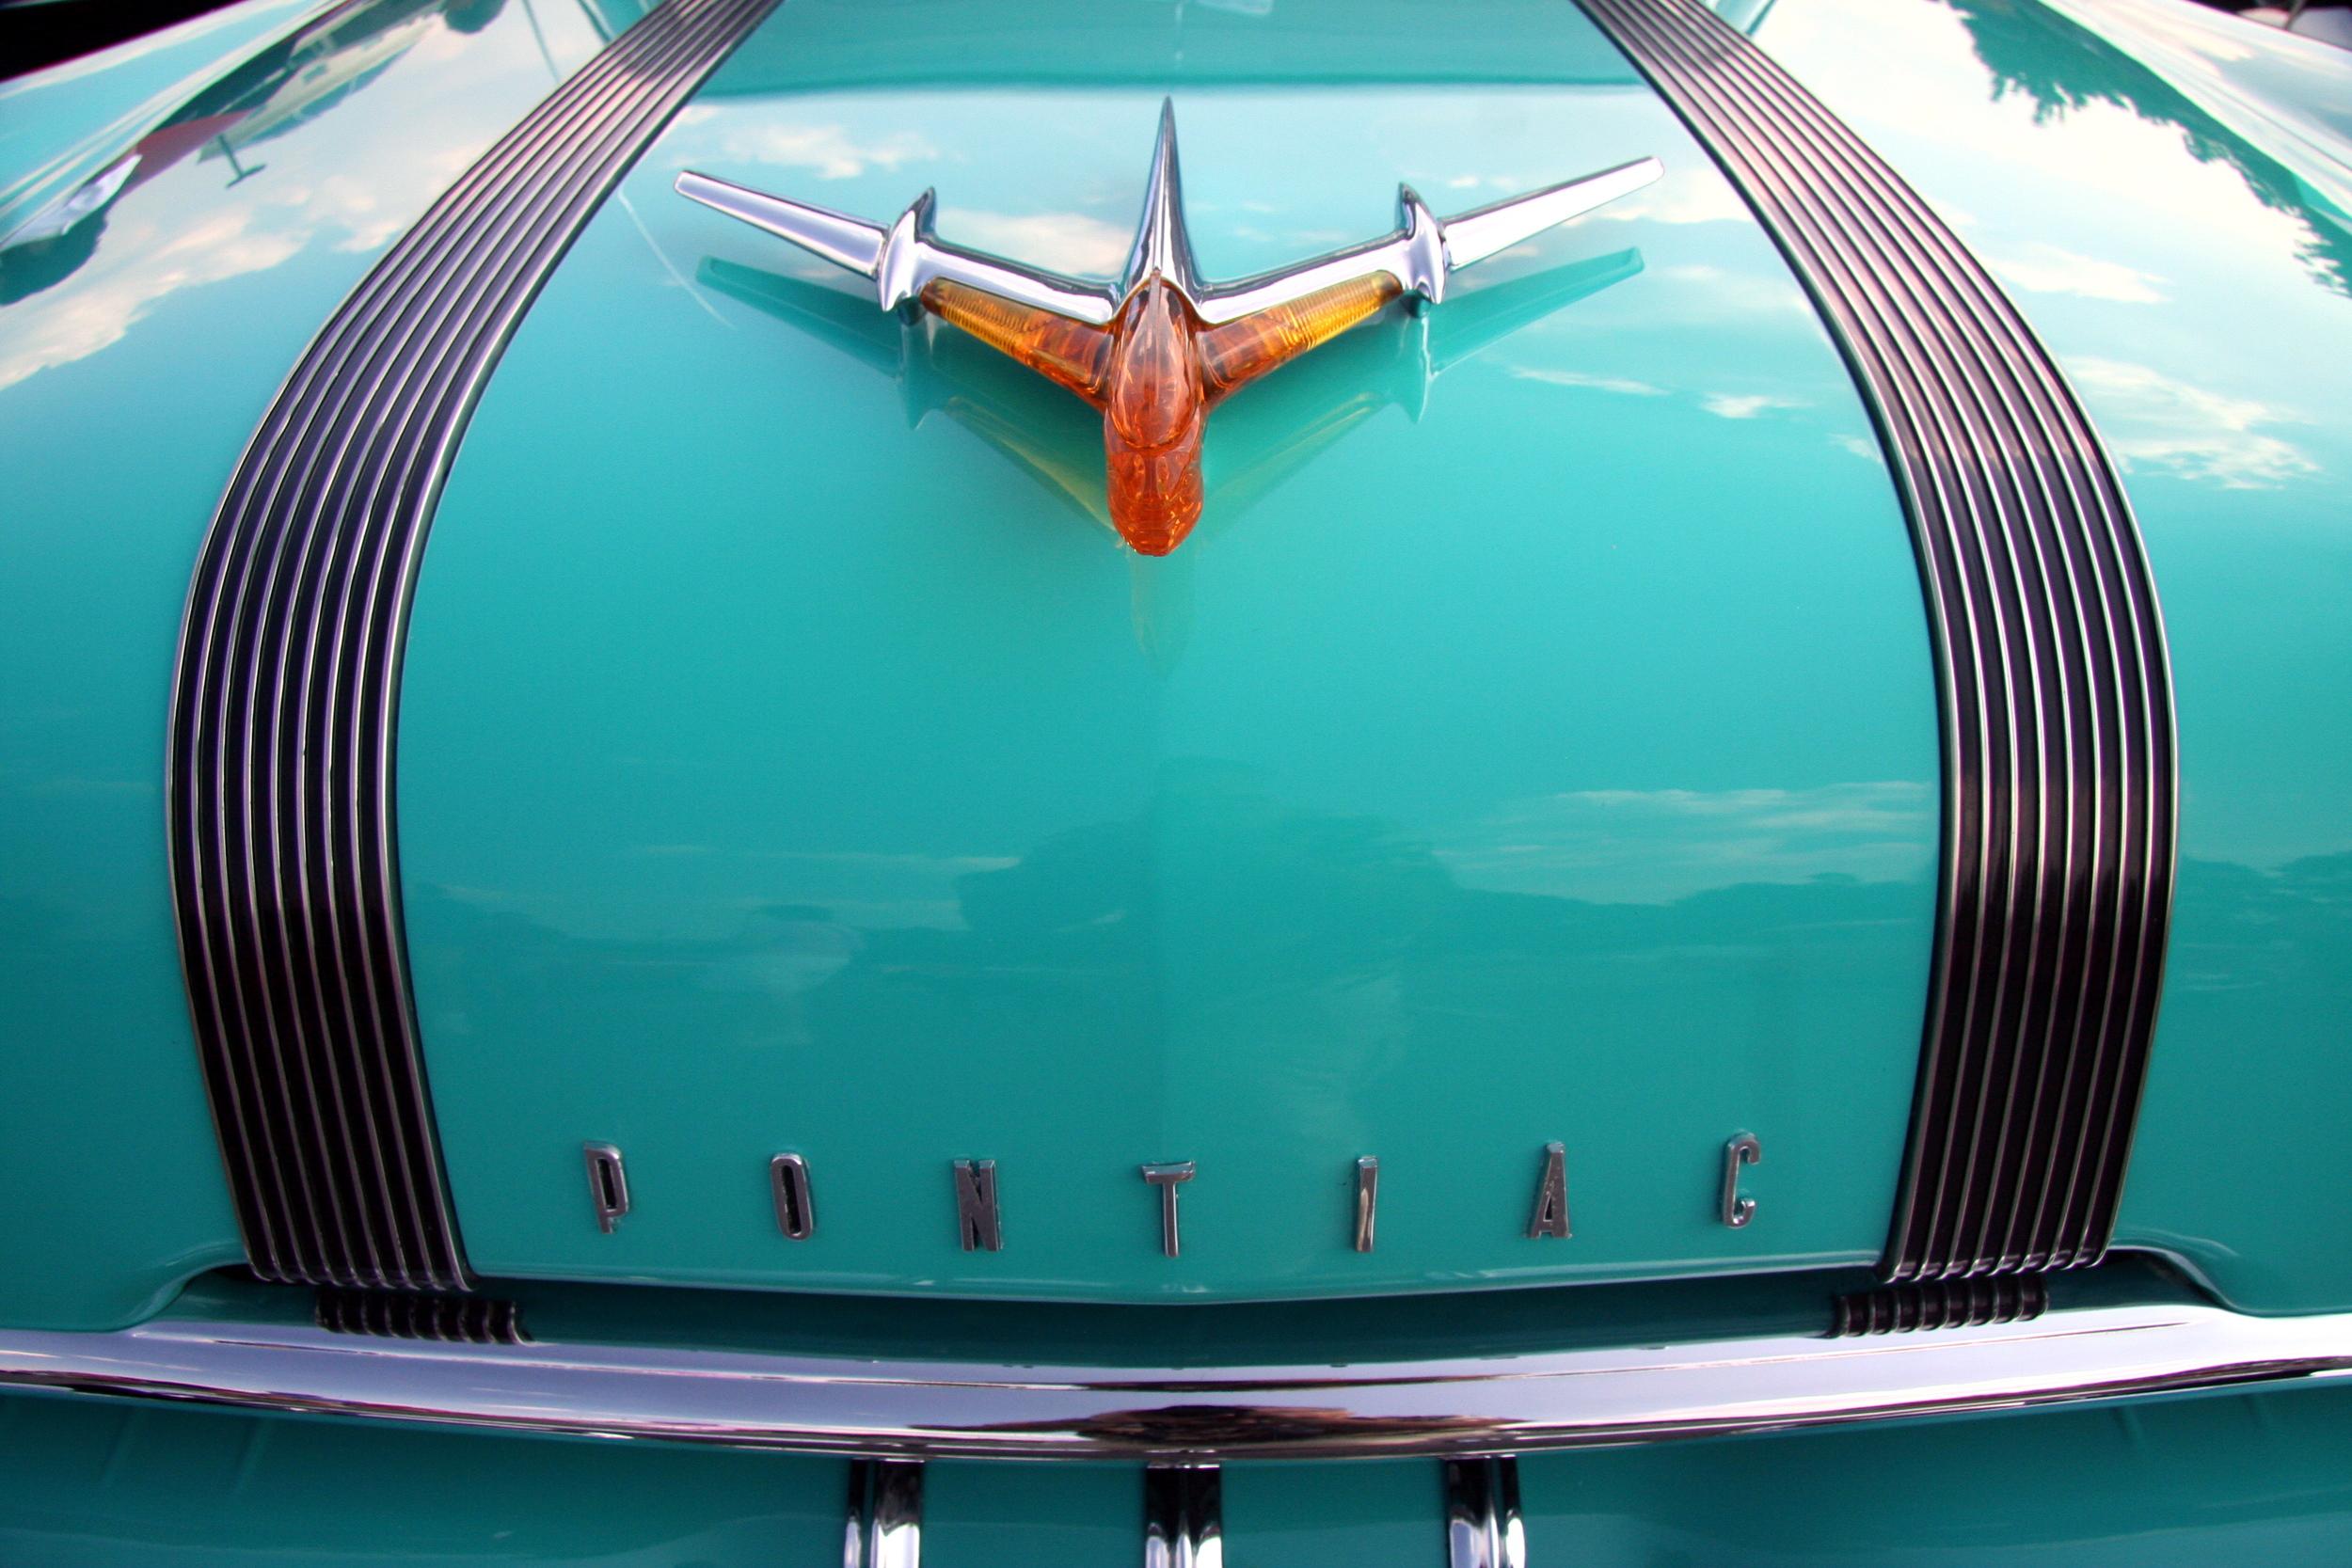 1955 Pontiac Starchief Hardtop.jpg